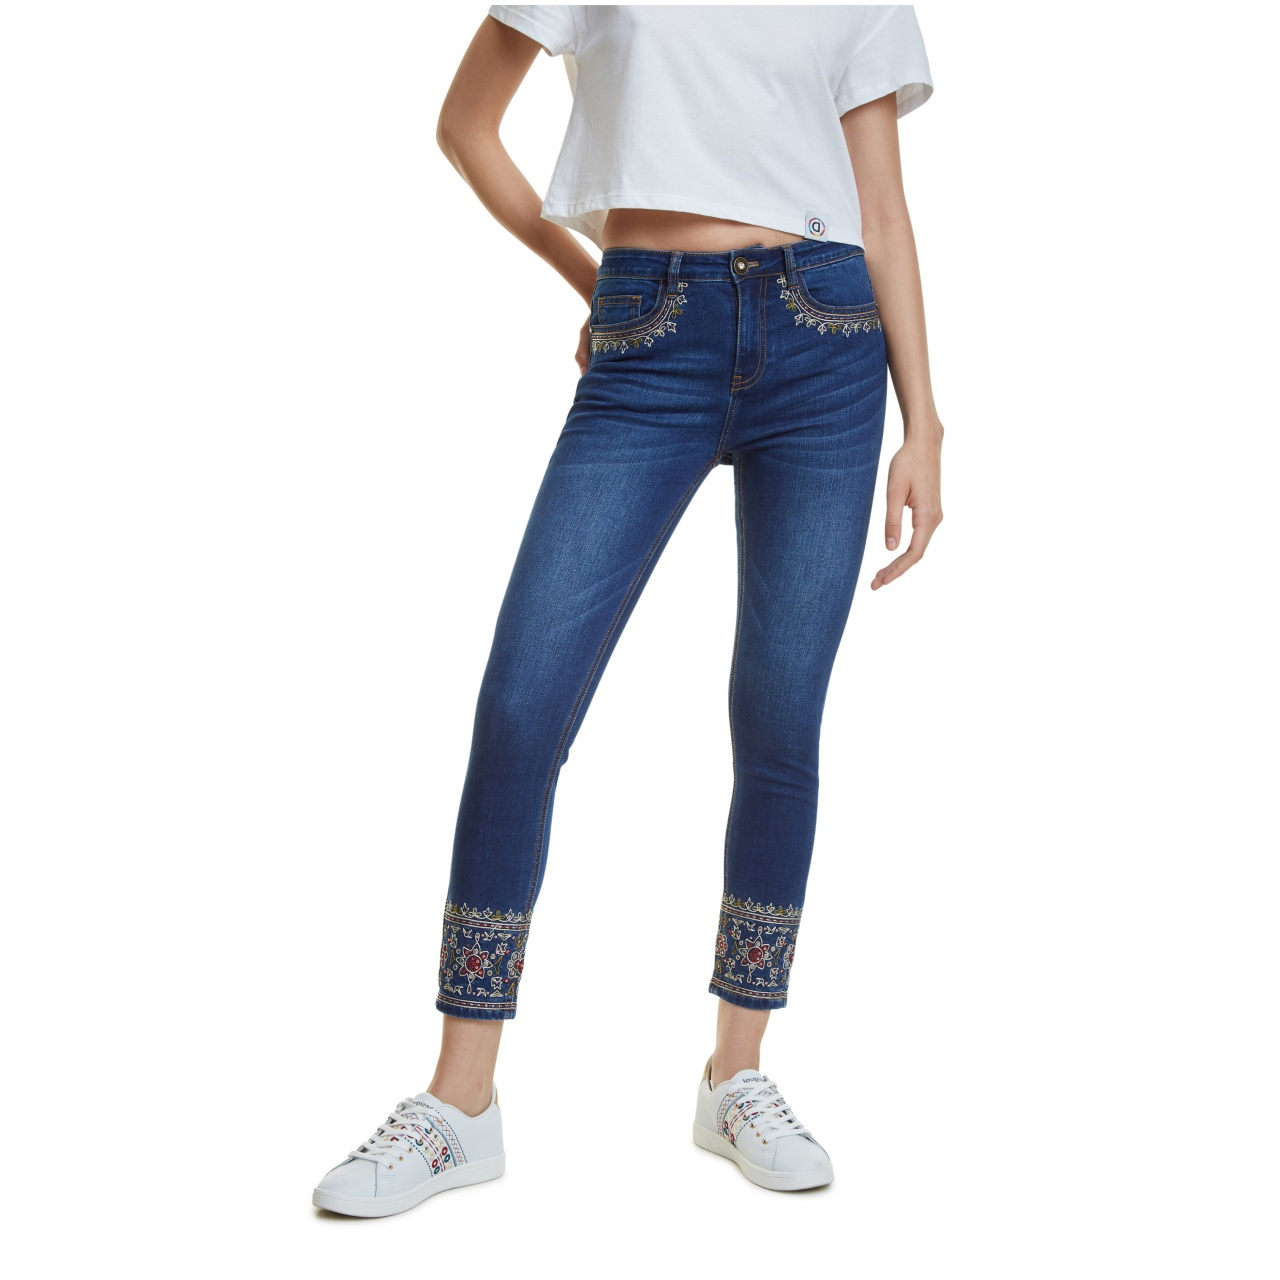 Pantaloni Desigual Denim Floyer :: 26